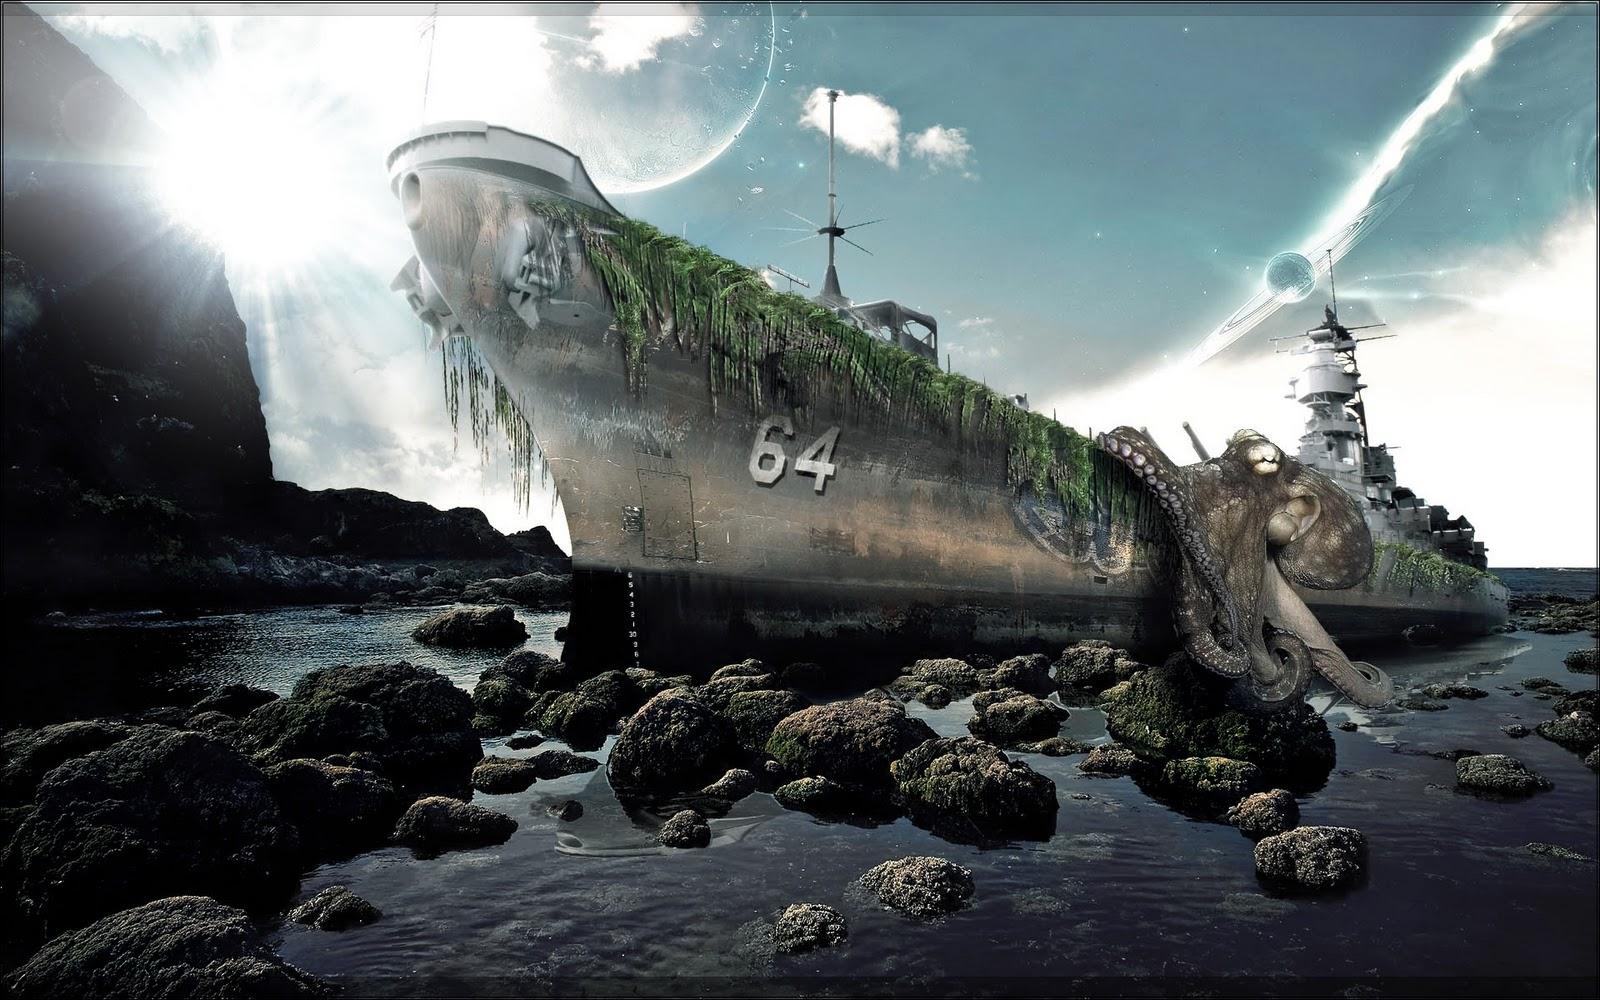 http://3.bp.blogspot.com/_Gq1jO6iuU2U/TTtnVuXKiSI/AAAAAAAAHf8/u-8_uxLLoh0/s1600/Ship+Giant+Octopuss+HD+Wallpaper.jpg